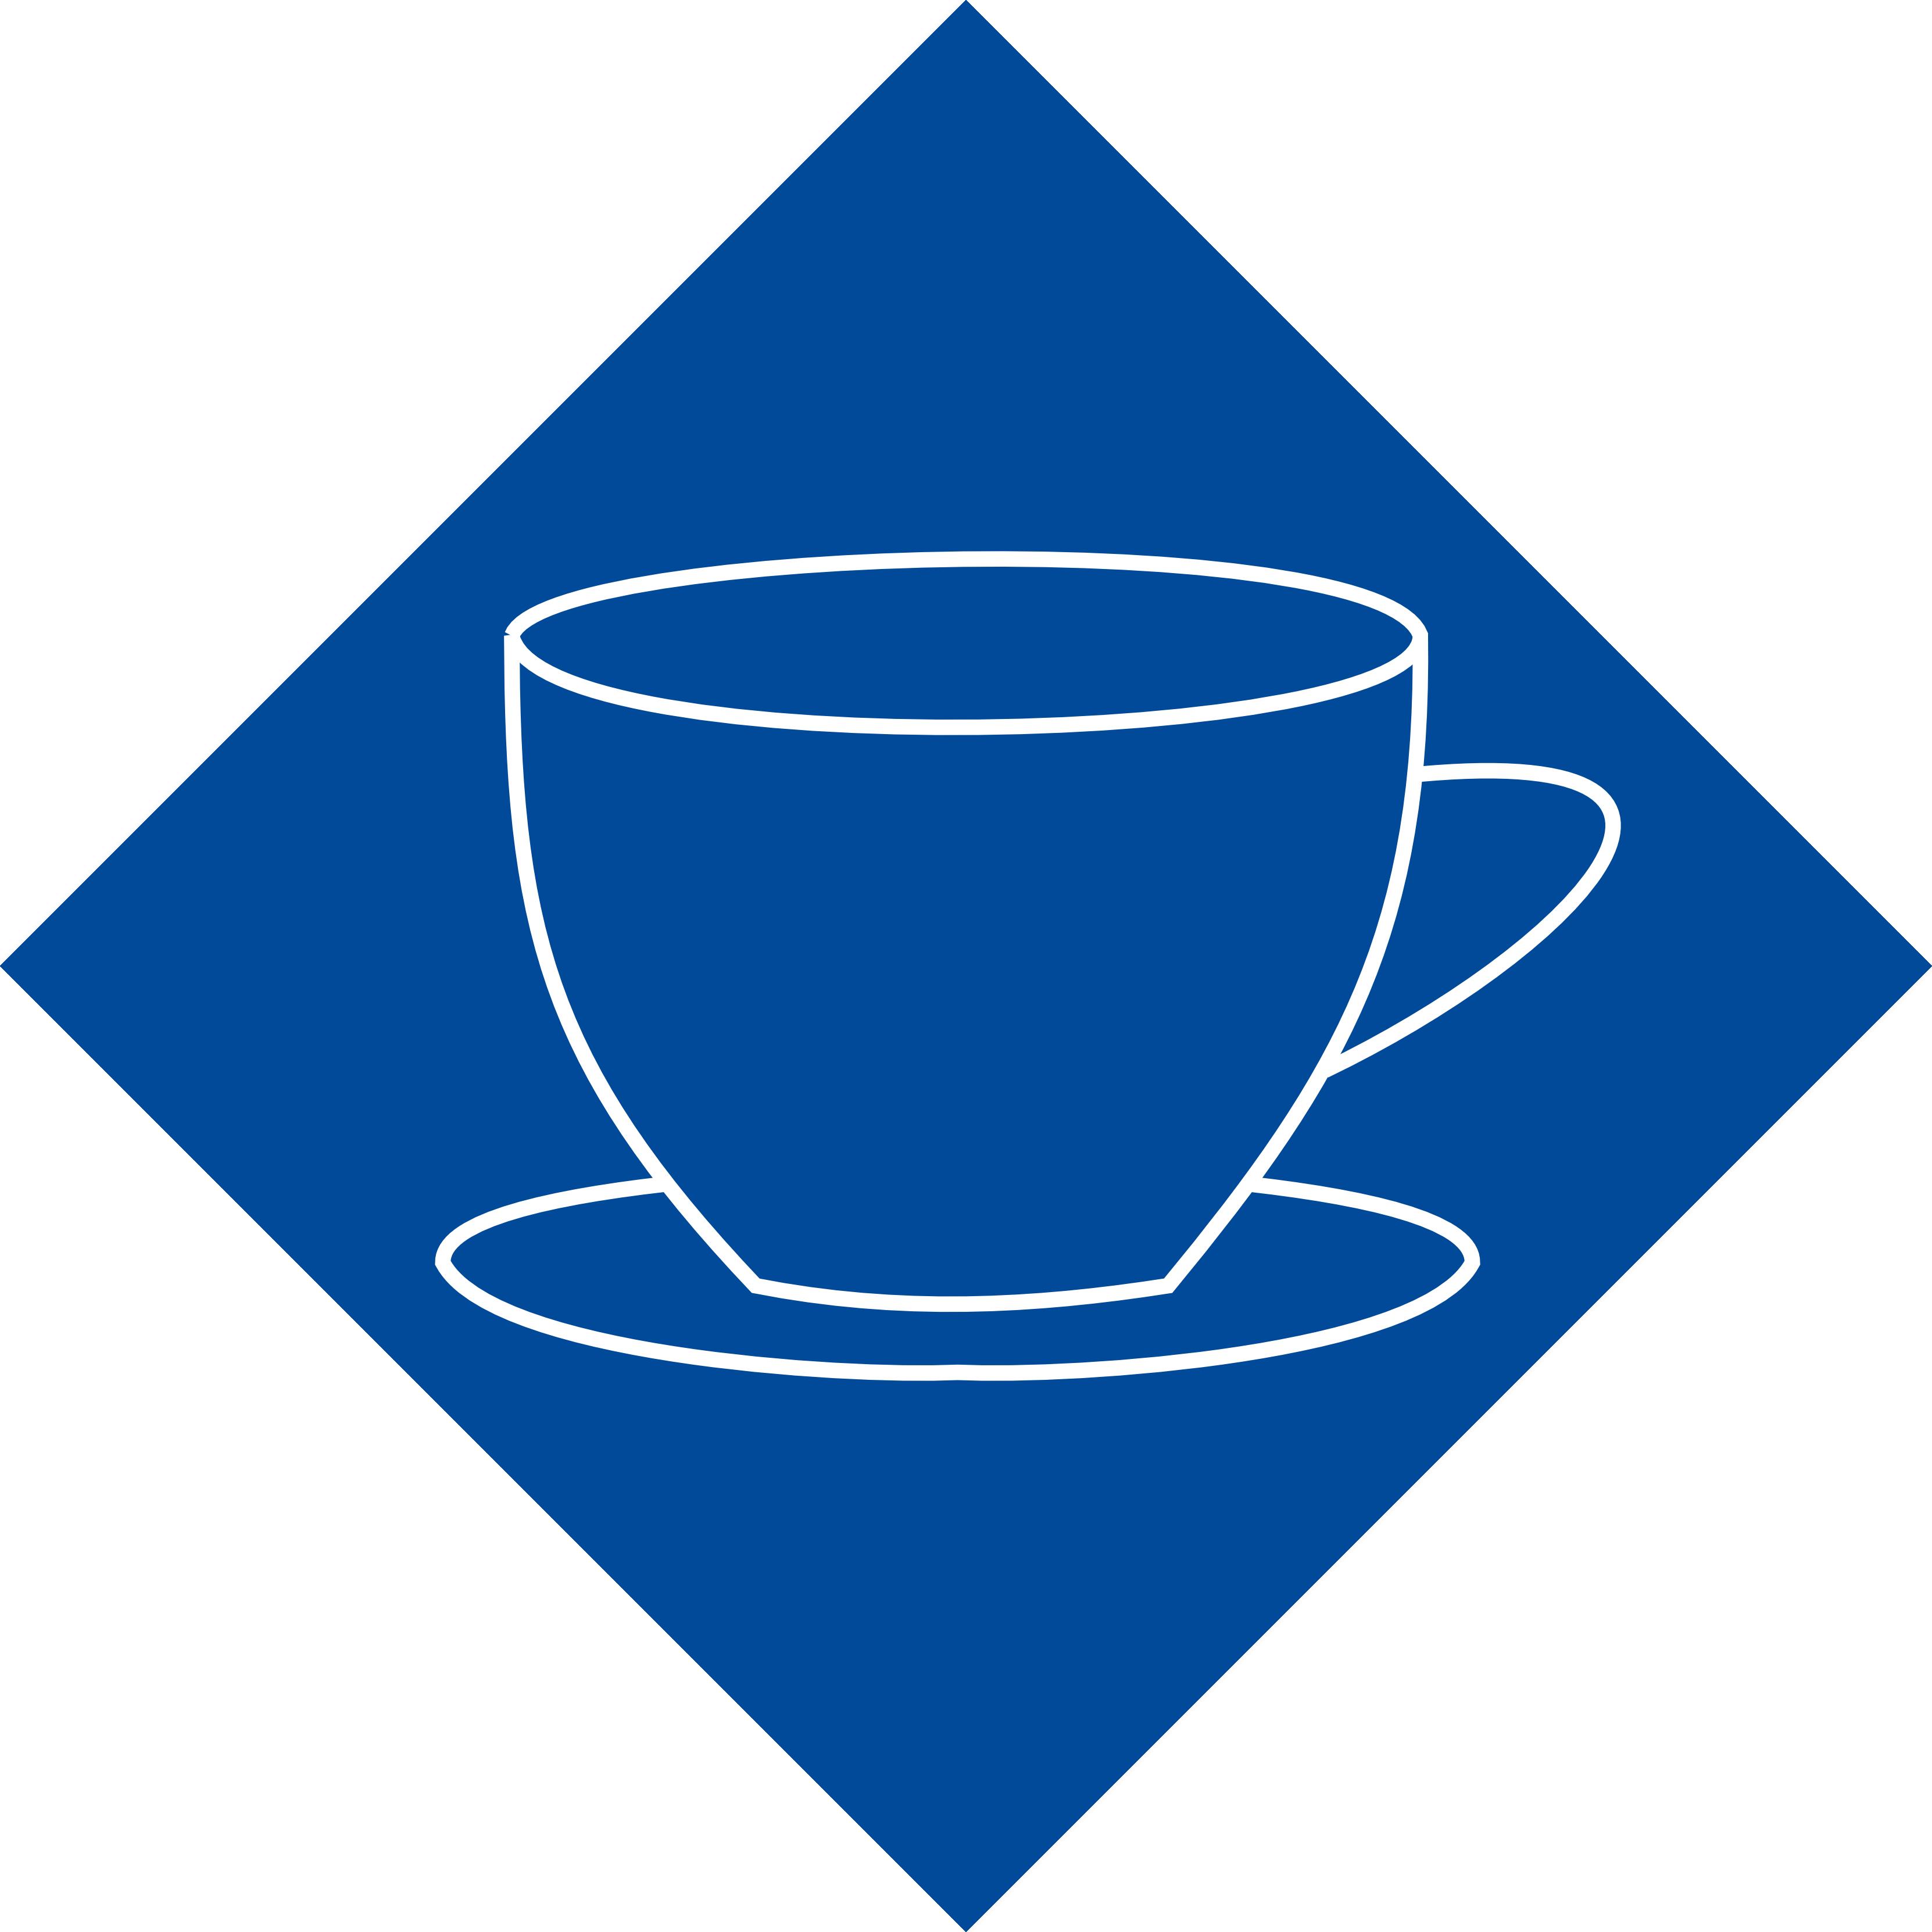 Genussmittel-Symbol